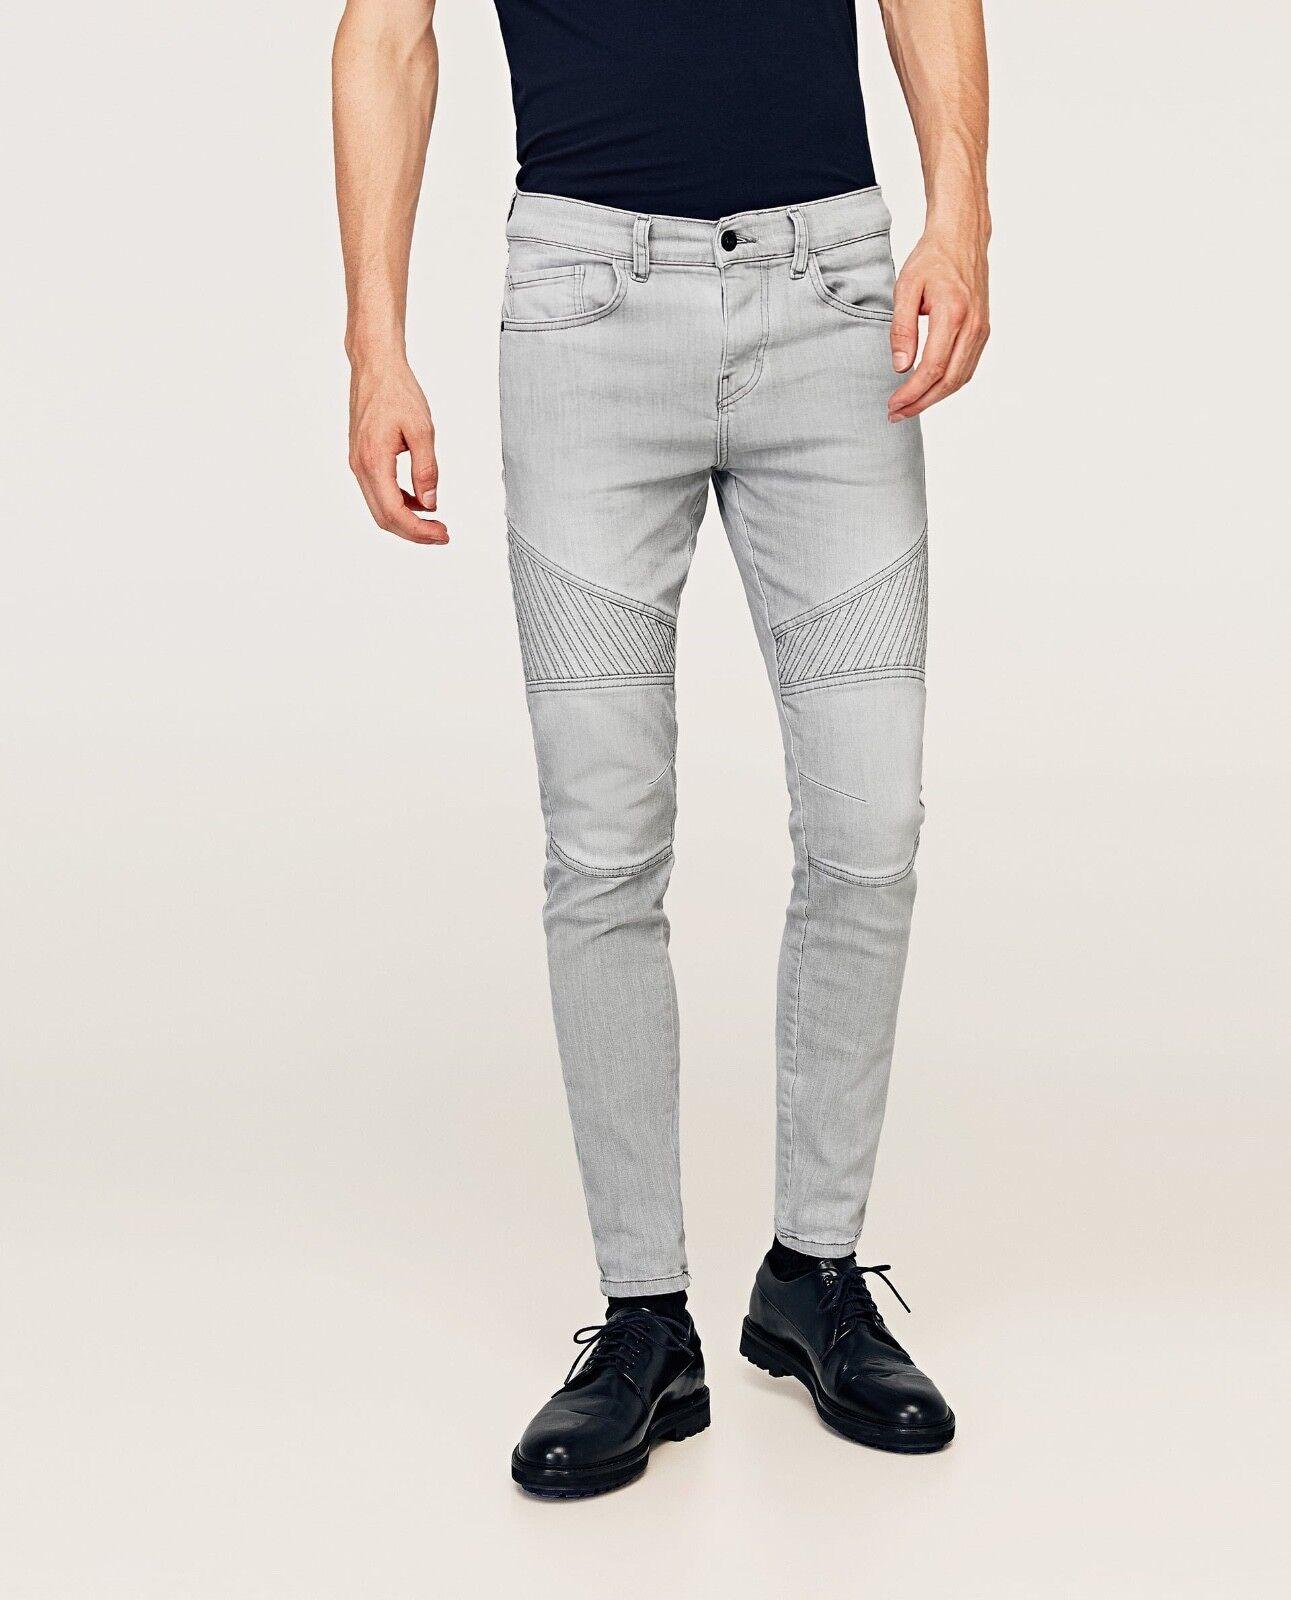 ZARA biker jeans Stretch Denim SOLD OUT EVERYWHERE